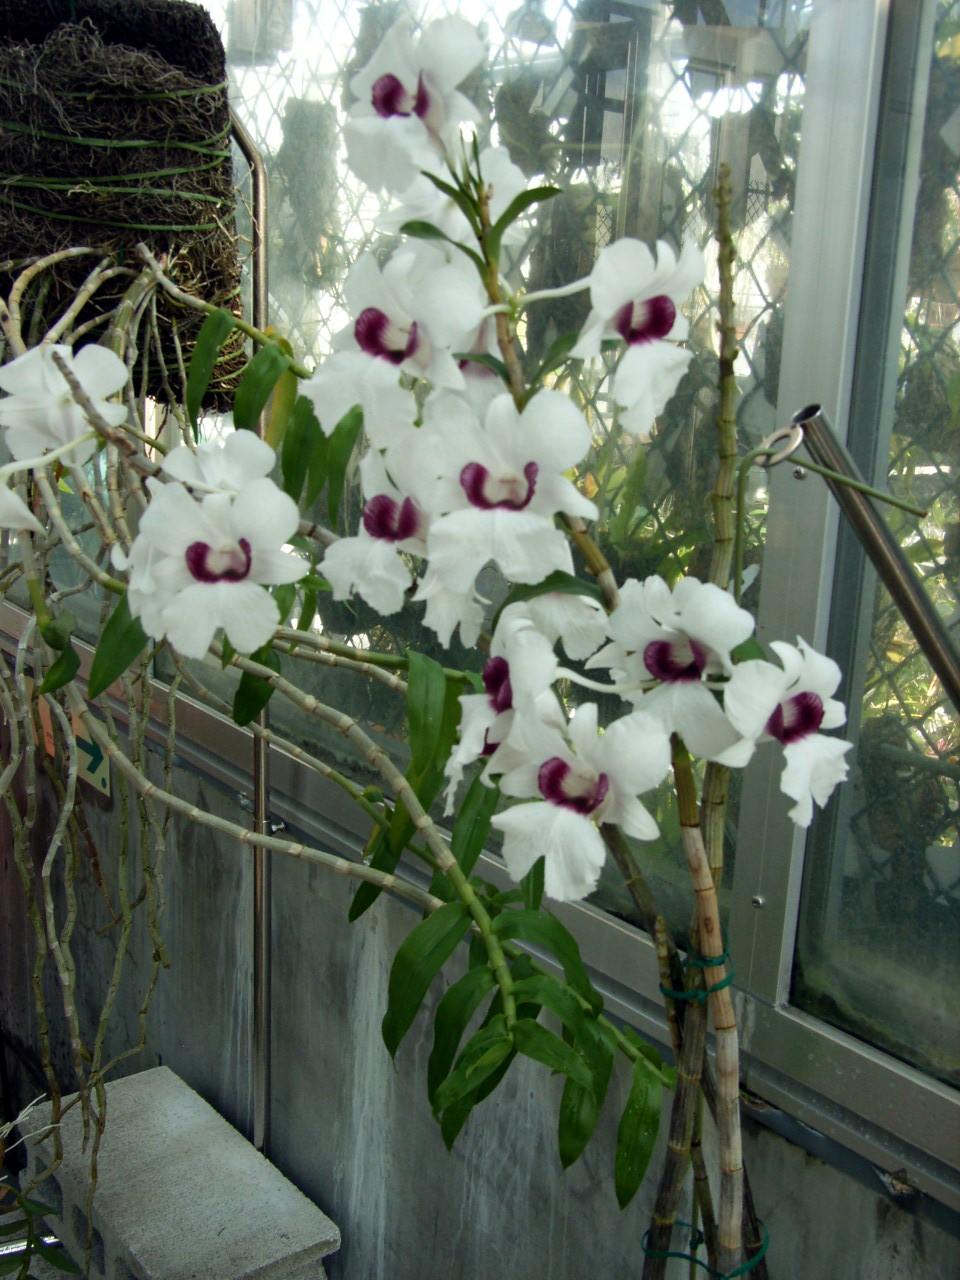 http://orchids.la.coocan.jp/Dendrobium/Dendrobium%20sanderae%20major/R0054593.JPG